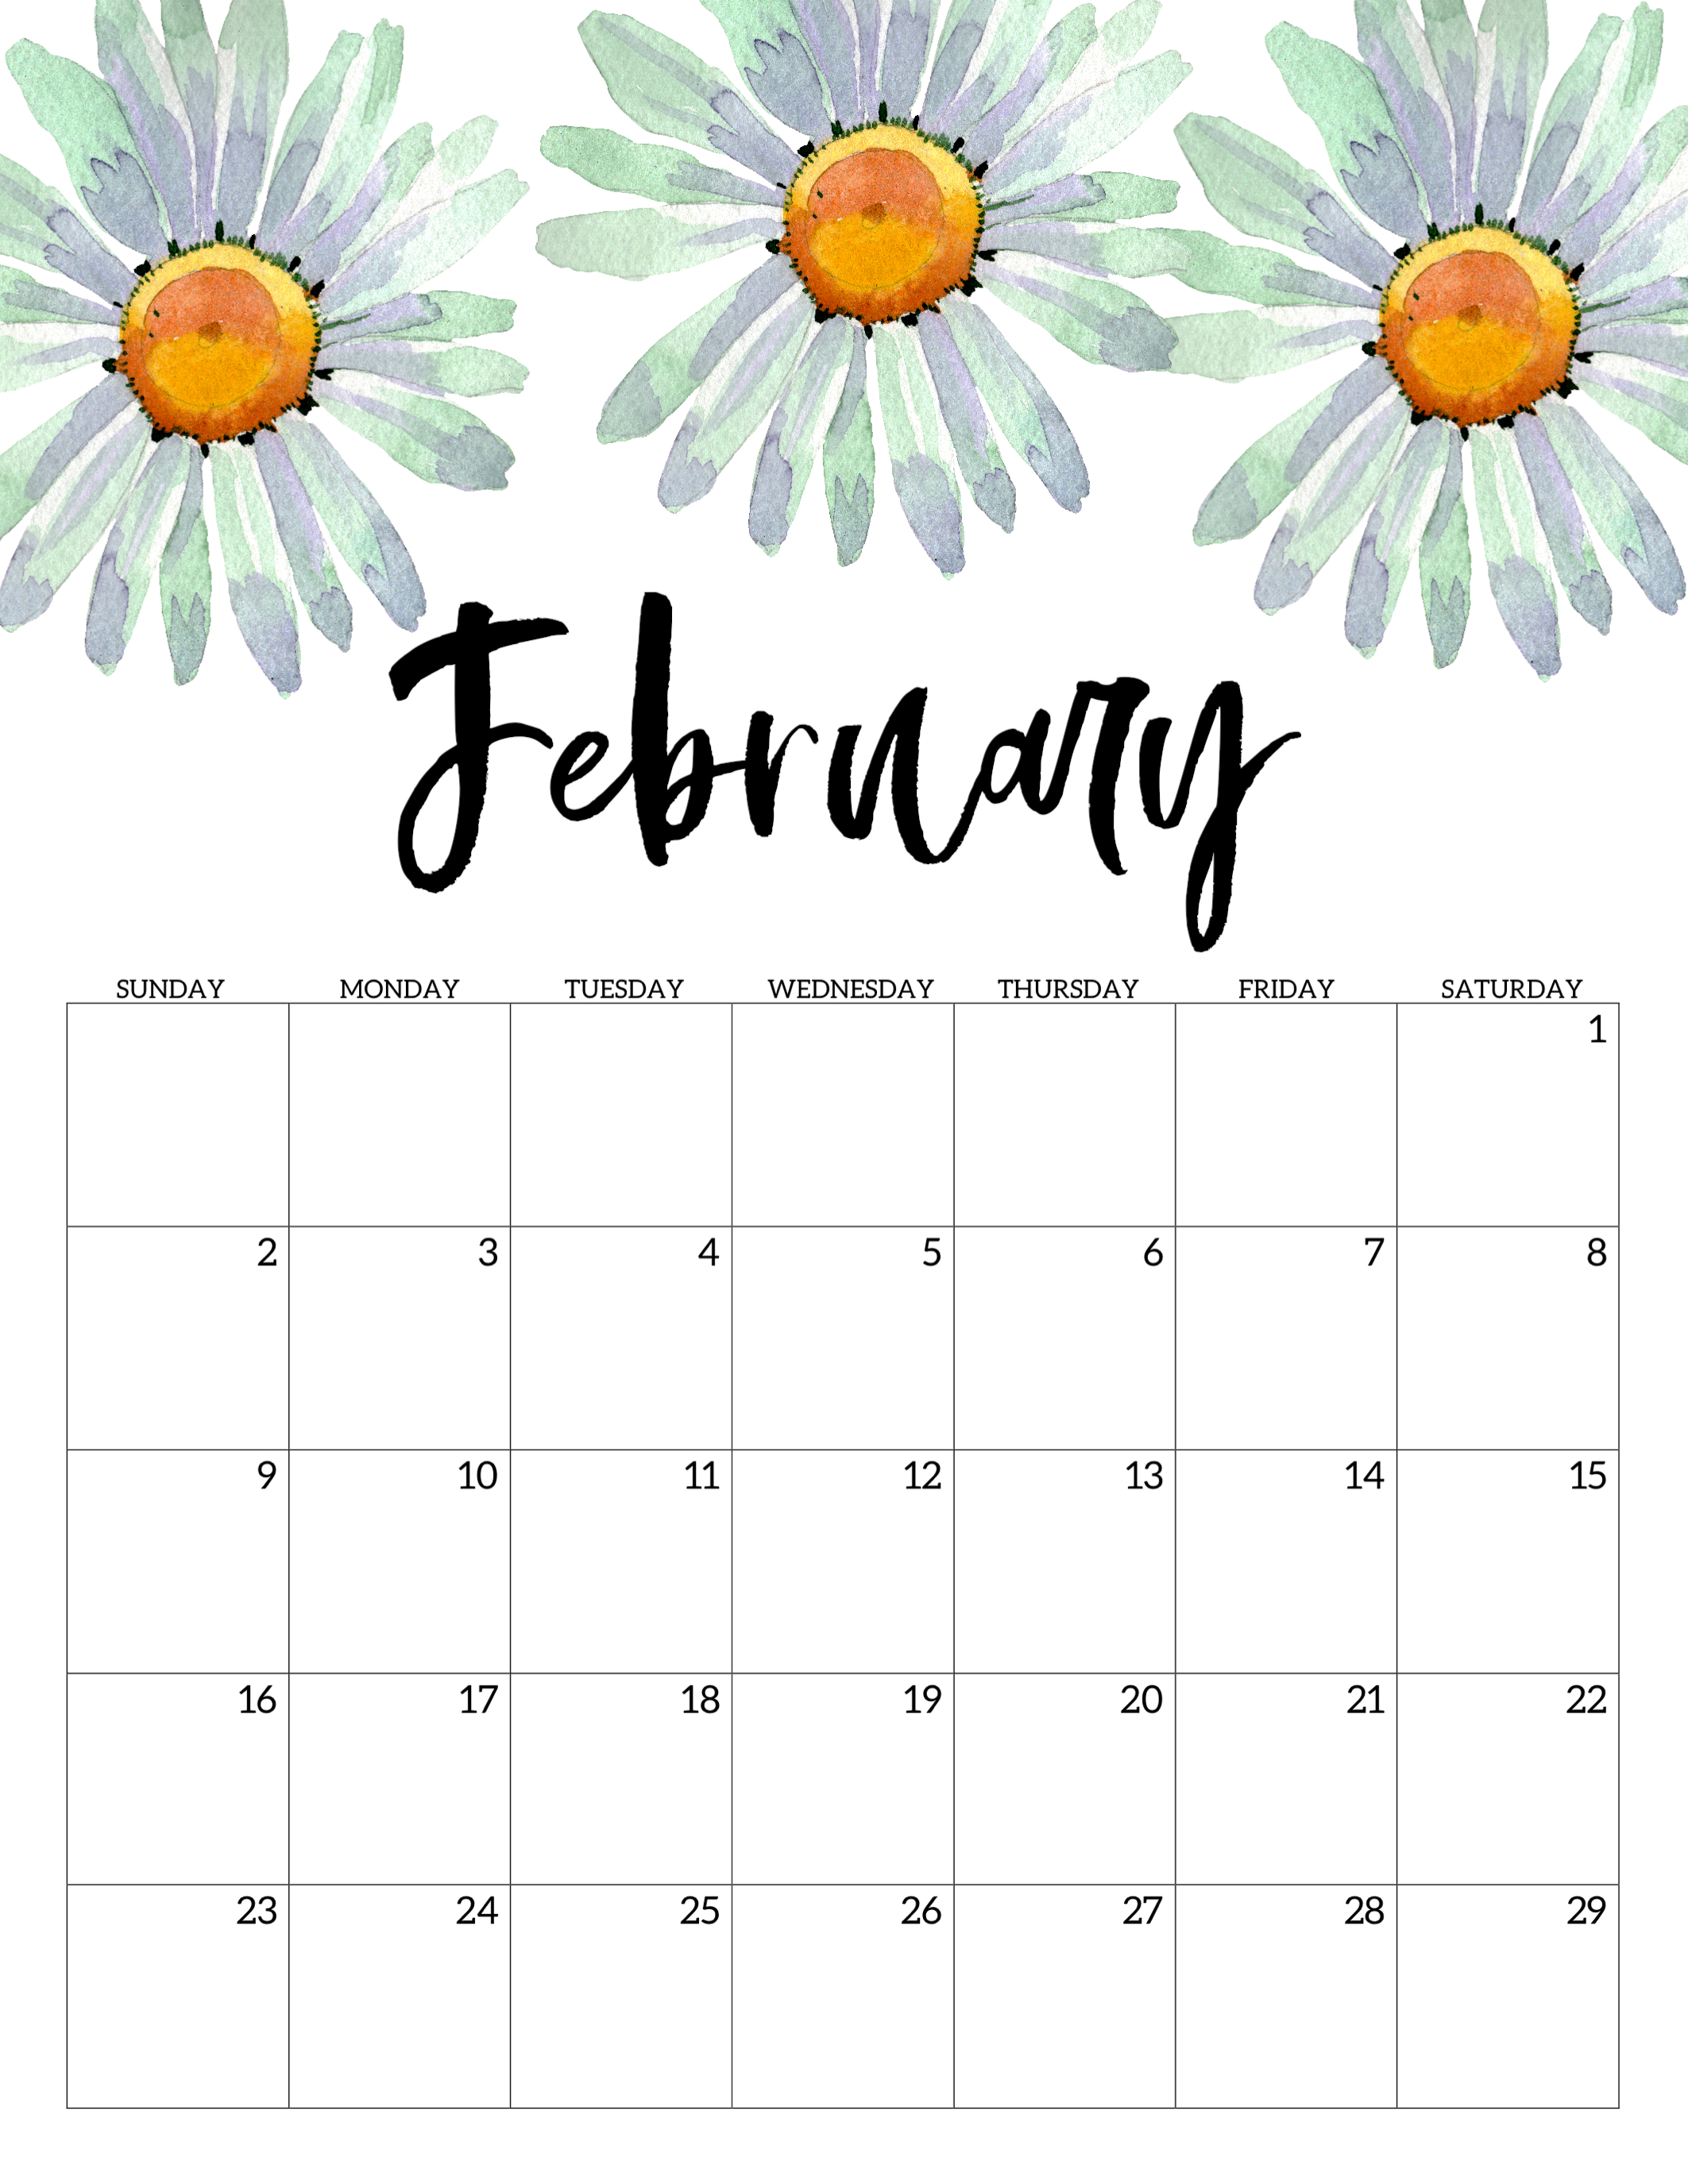 Free Calendar 2020.2020 Free Printable Calendar Floral Paper Trail Design